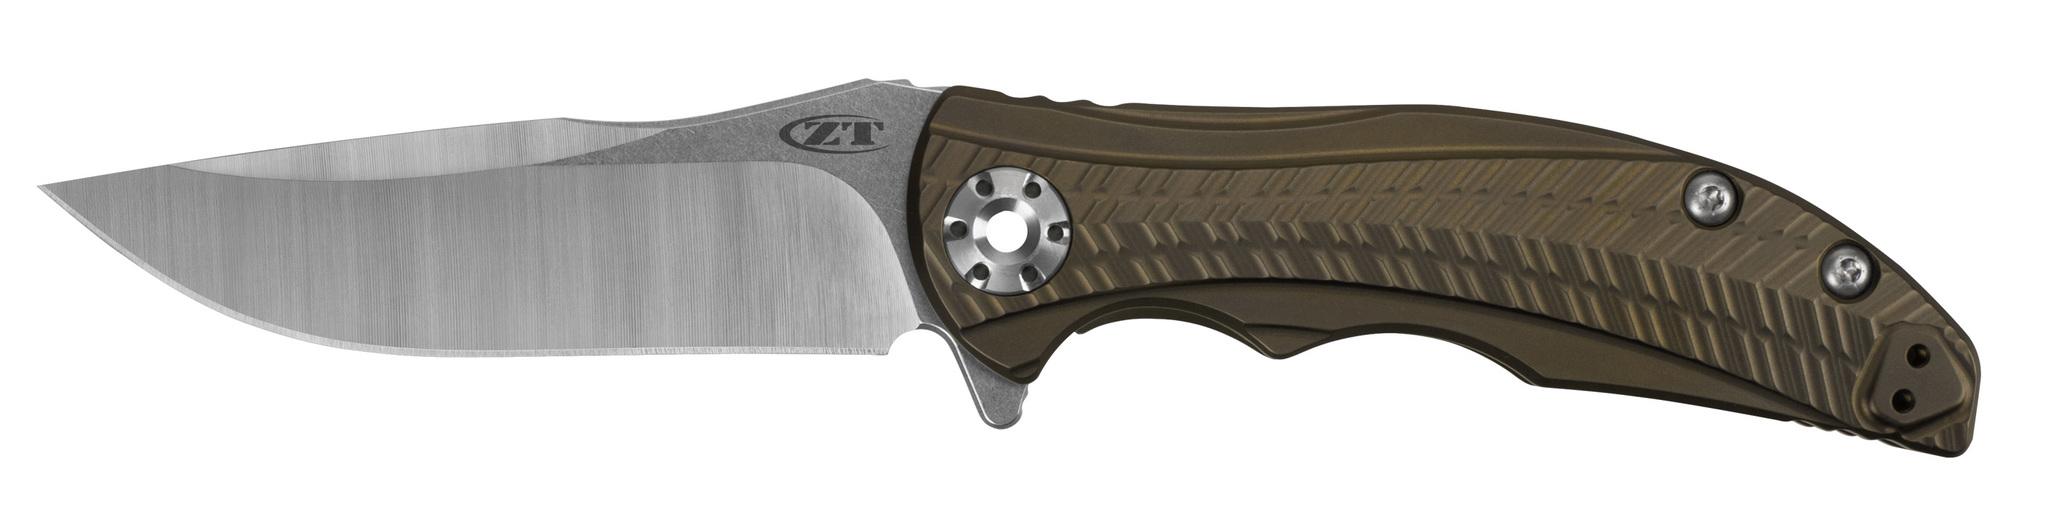 Складной нож Zero Tolerance 0609, сталь CPM 20CV, рукоять титан/бронза